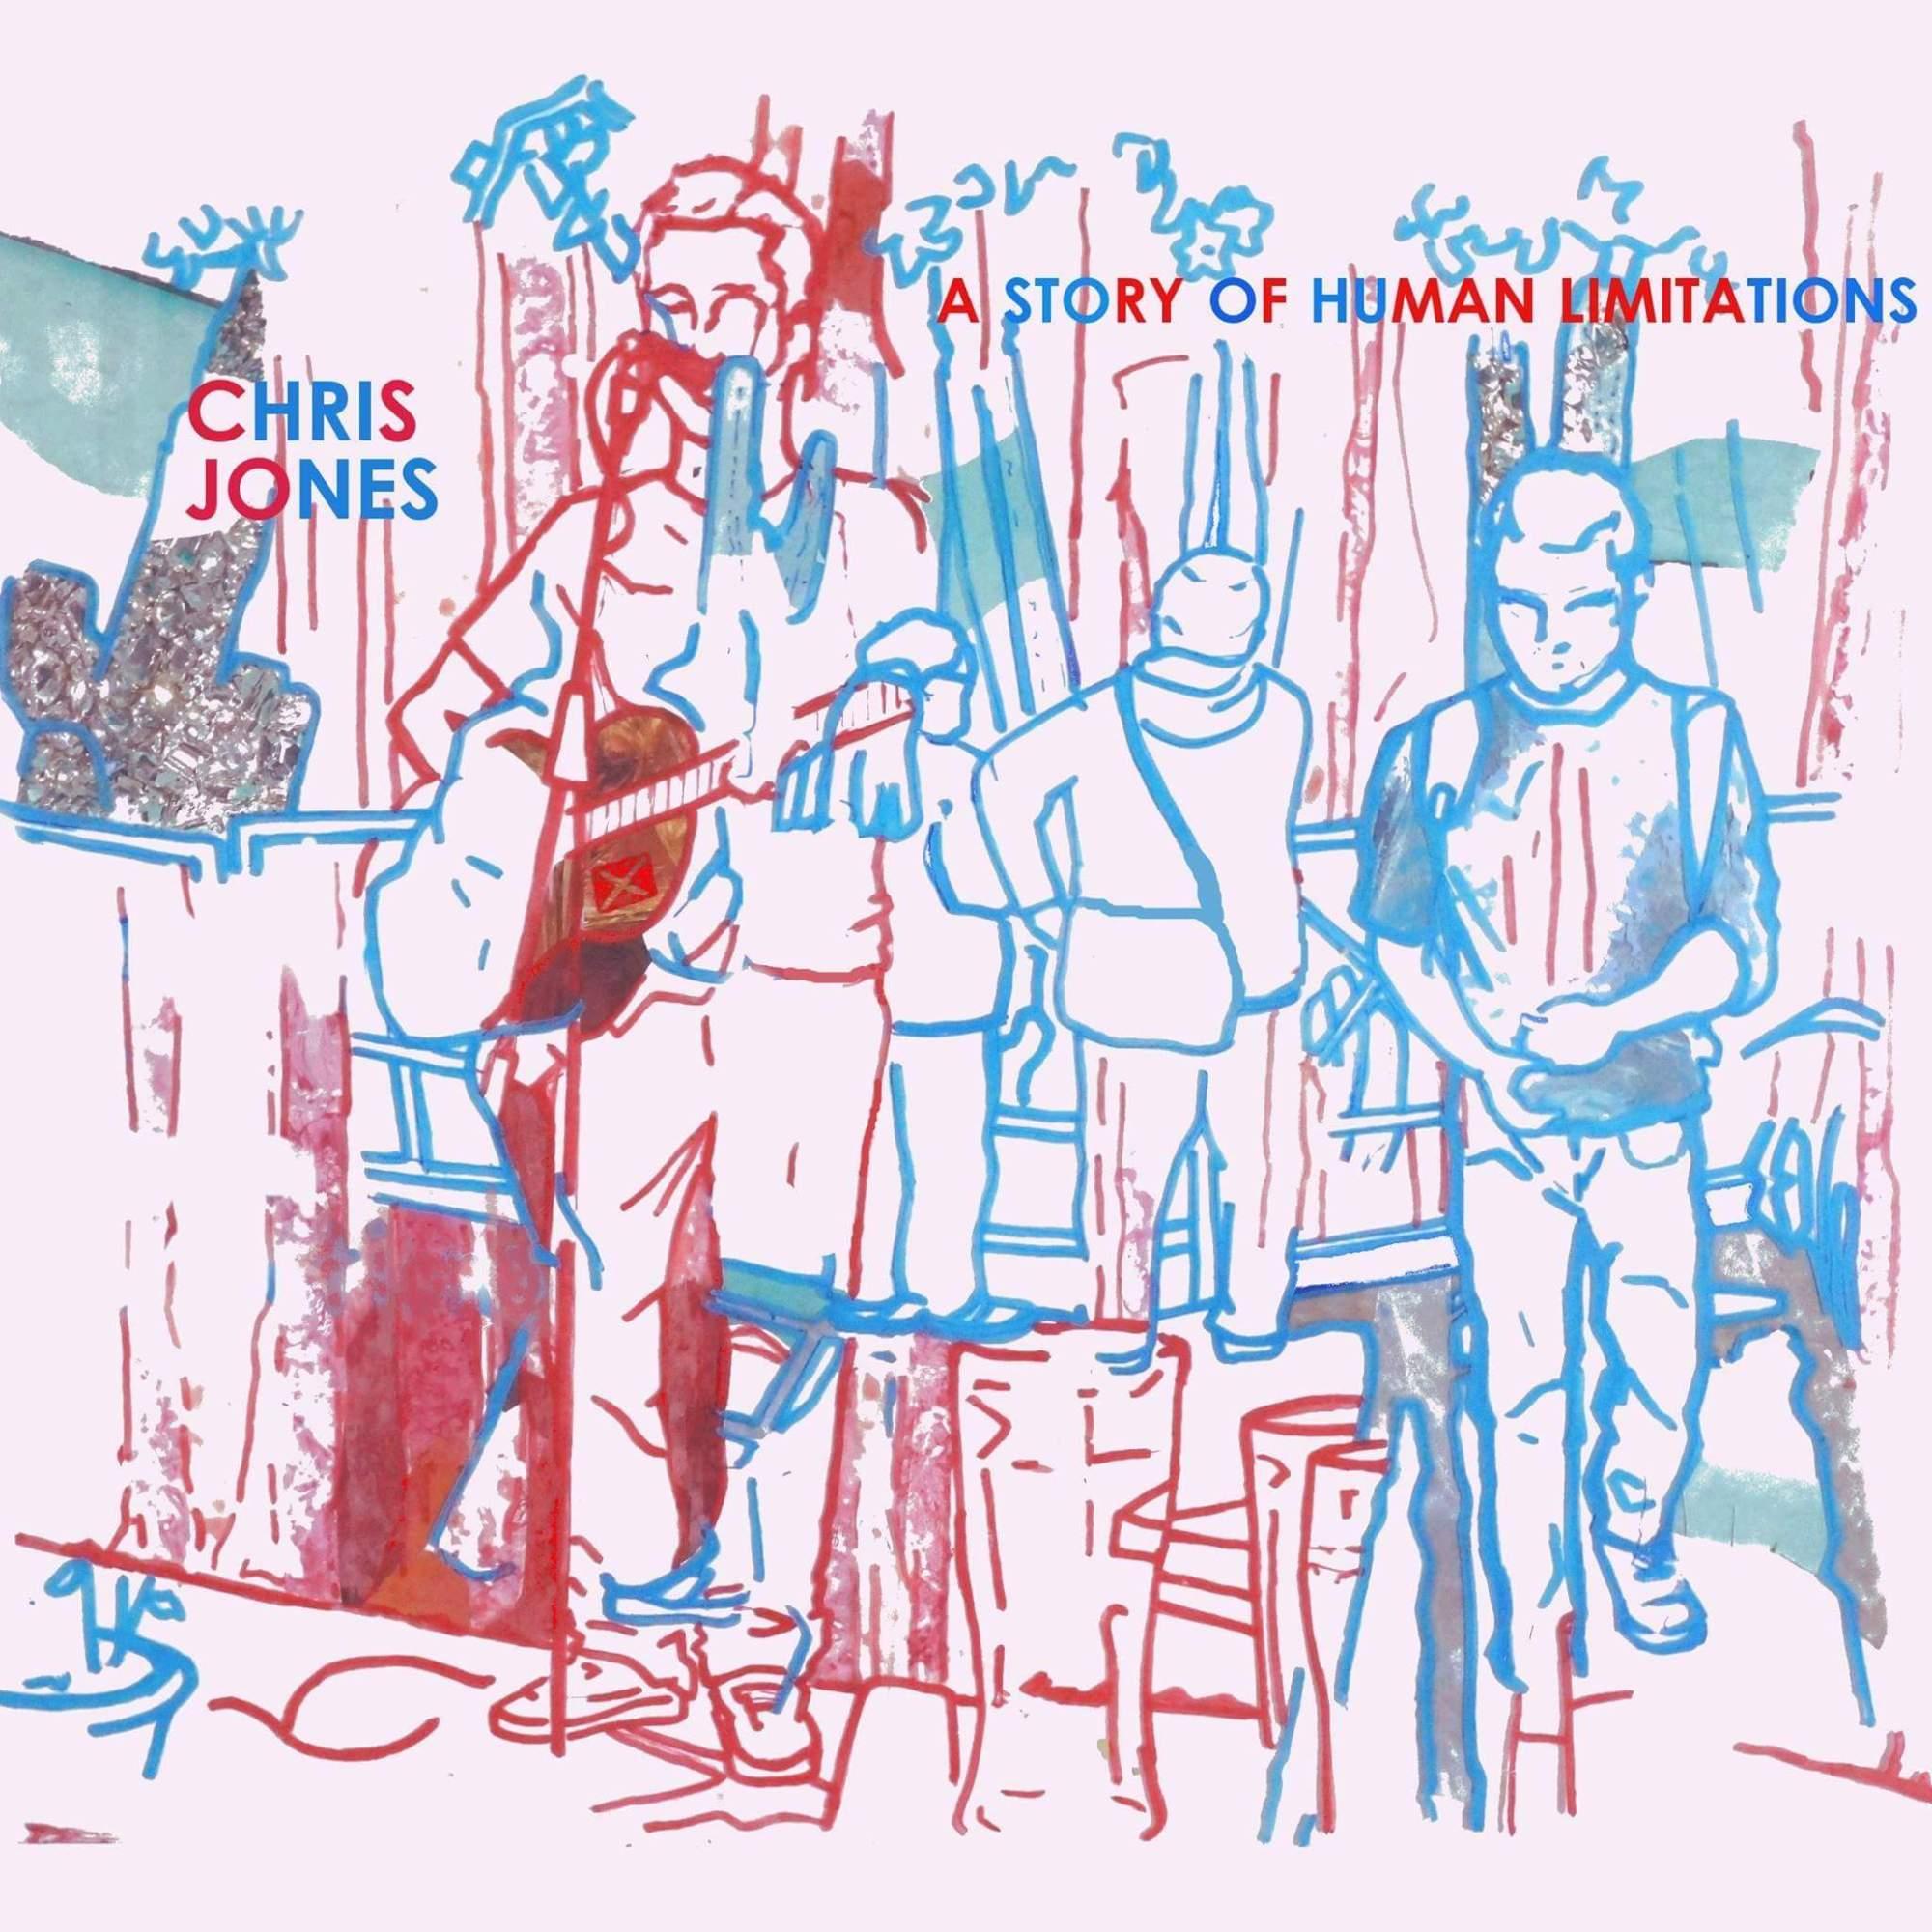 Chris Jones 'A Story of Human Limitations' Album Artwork